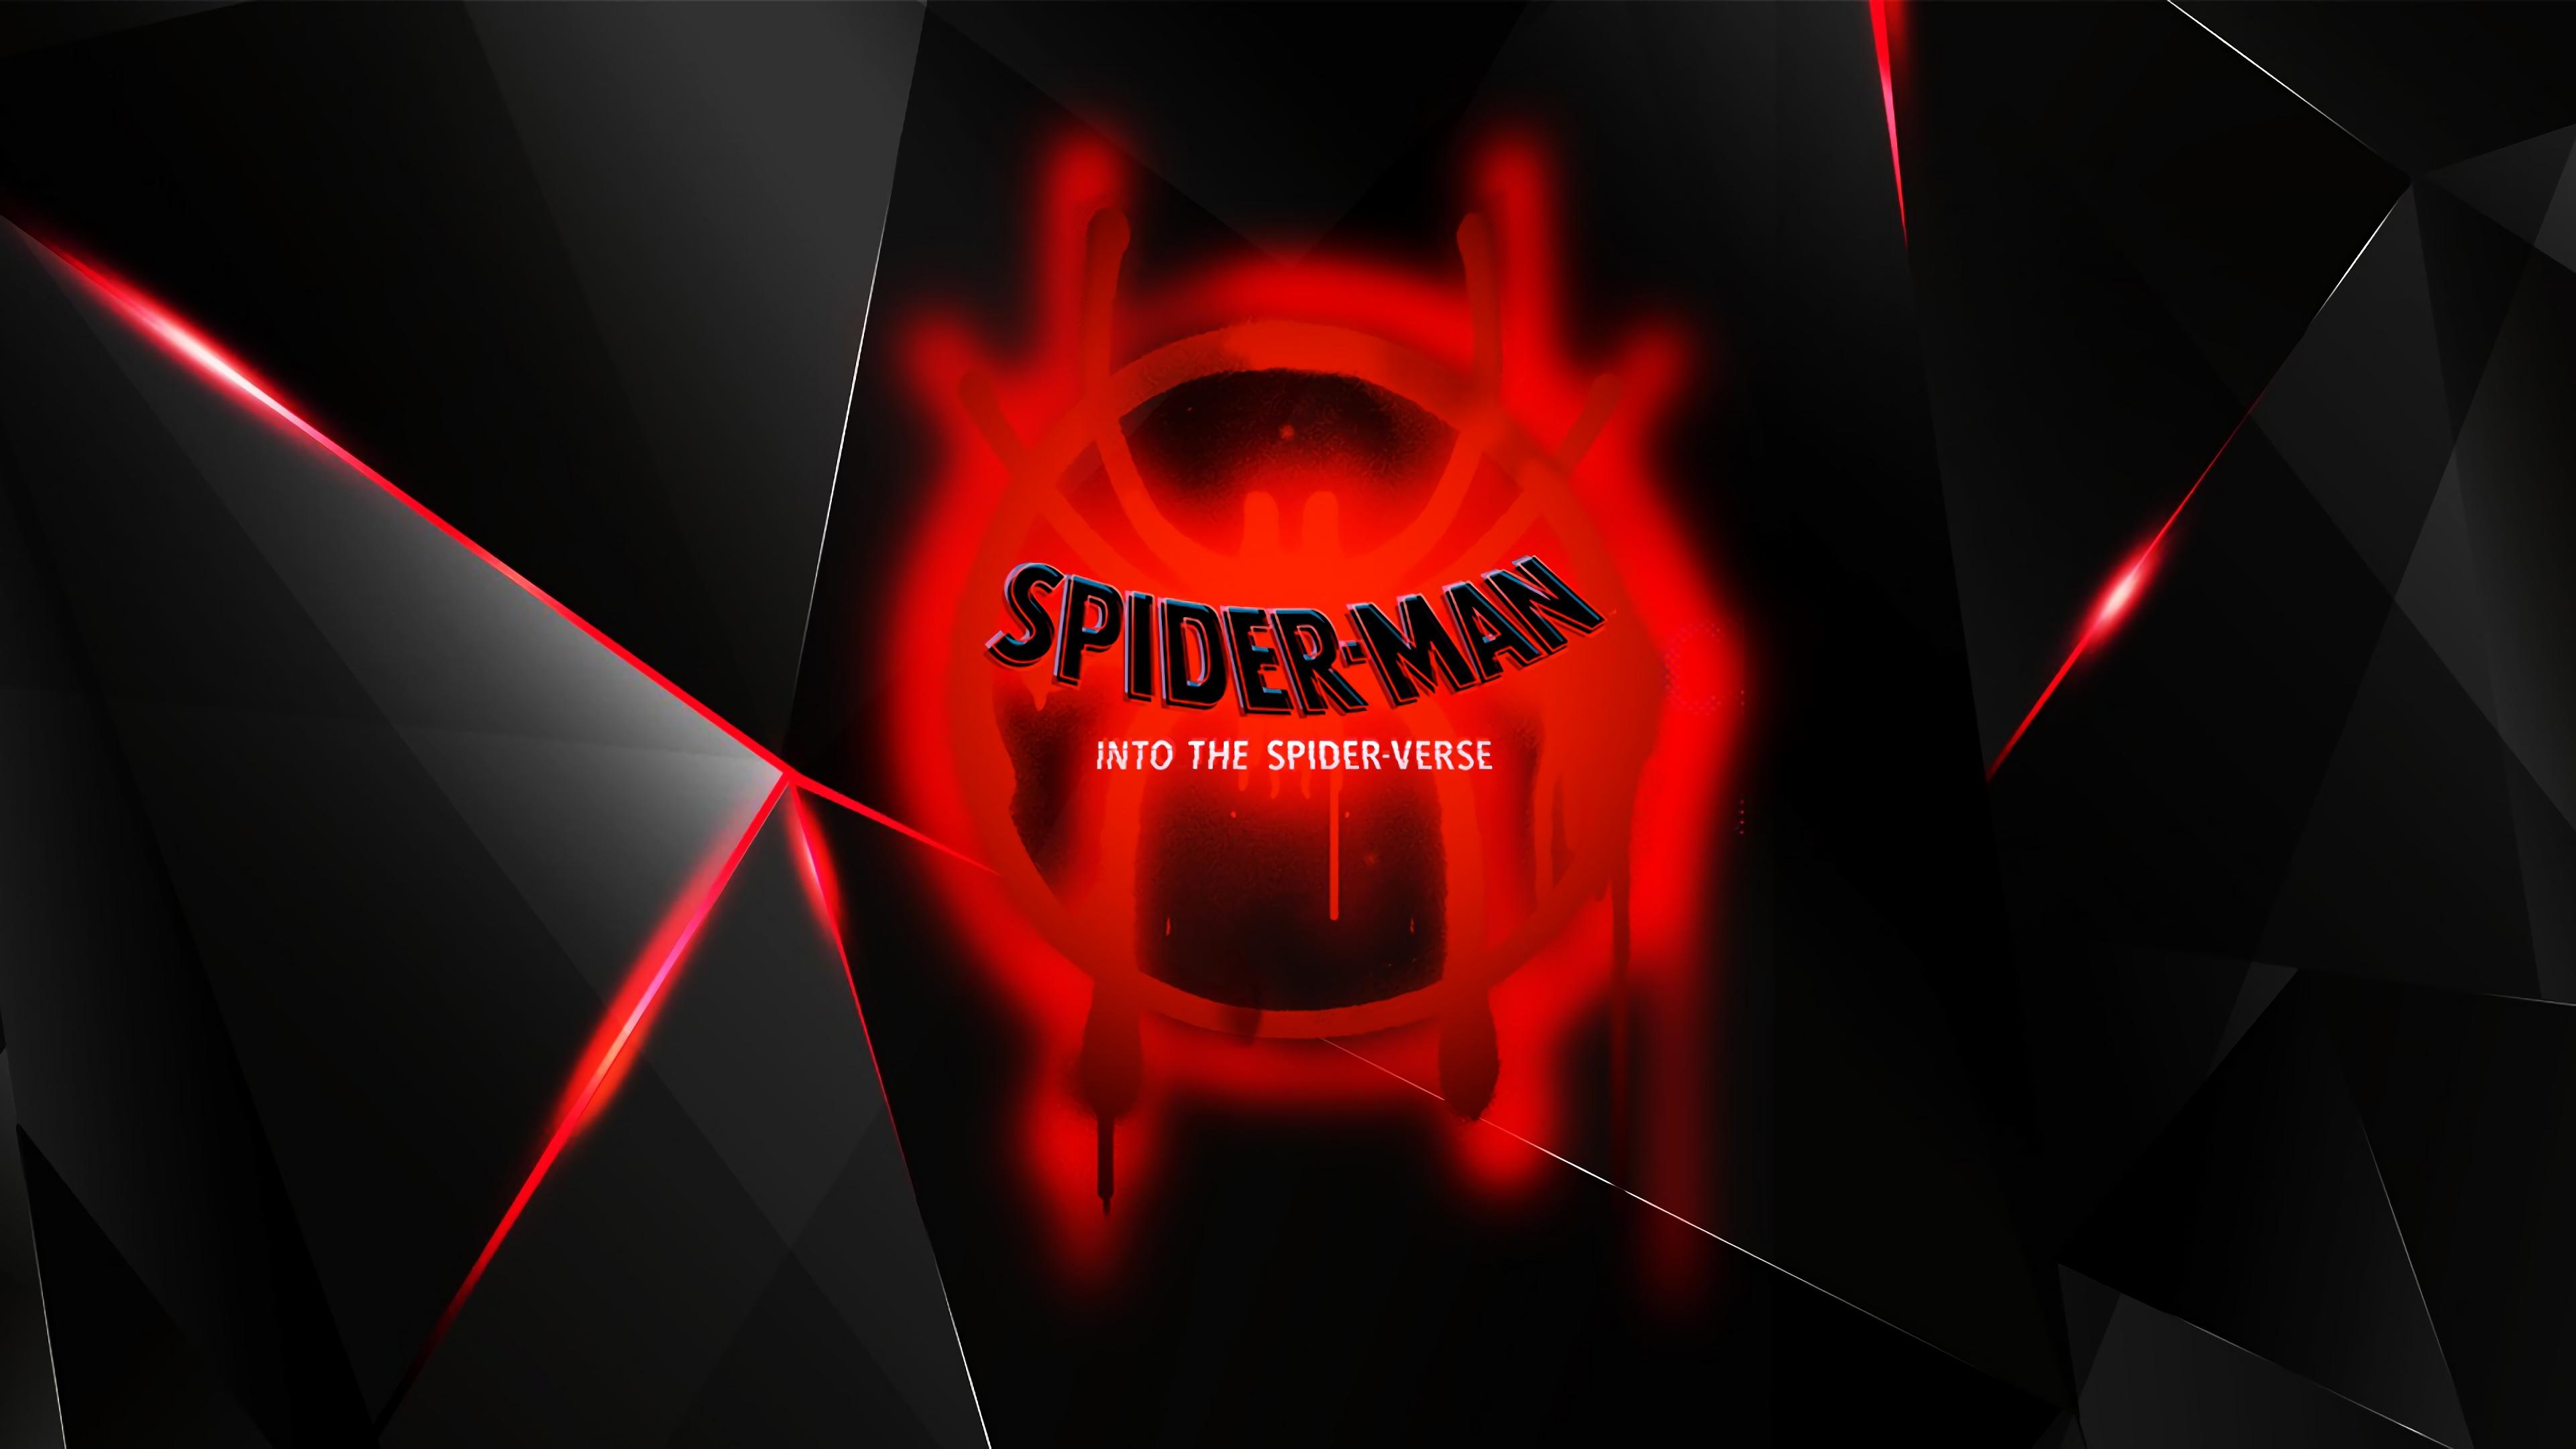 Spiderman Into The Spider Verse Movie 2018 Logo Hd Movies 4k